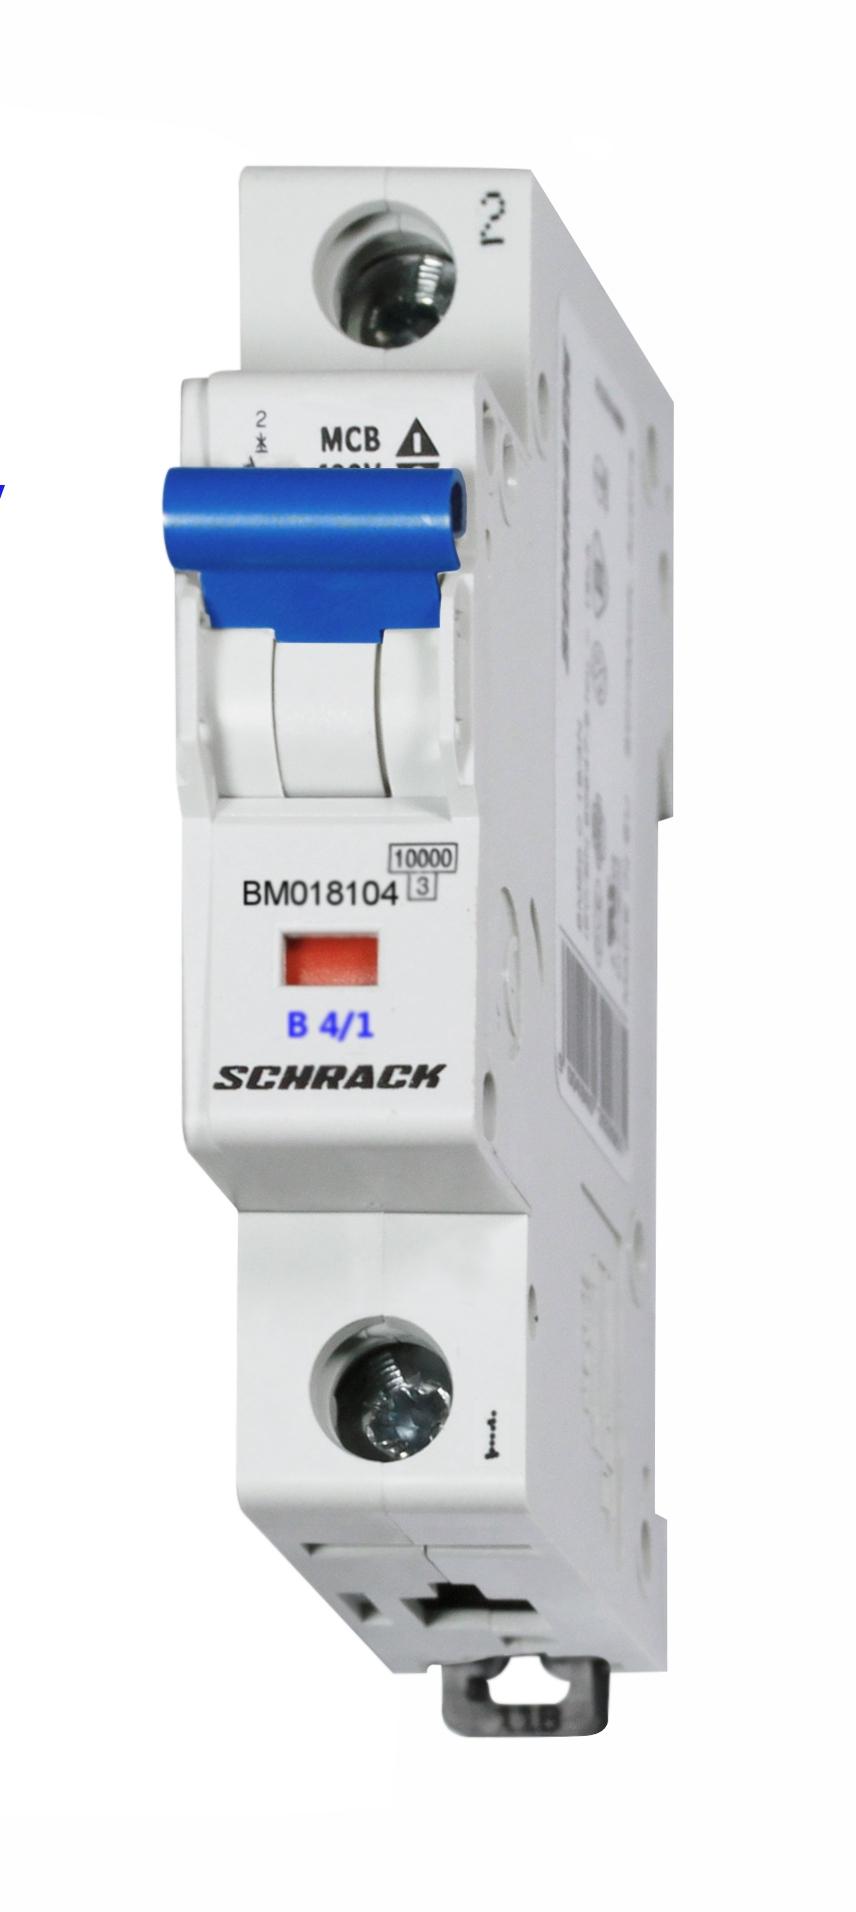 1 Stk Sicherungsautomat, Kennlinie B, 4A, 1-polig, 10kA BM018104--